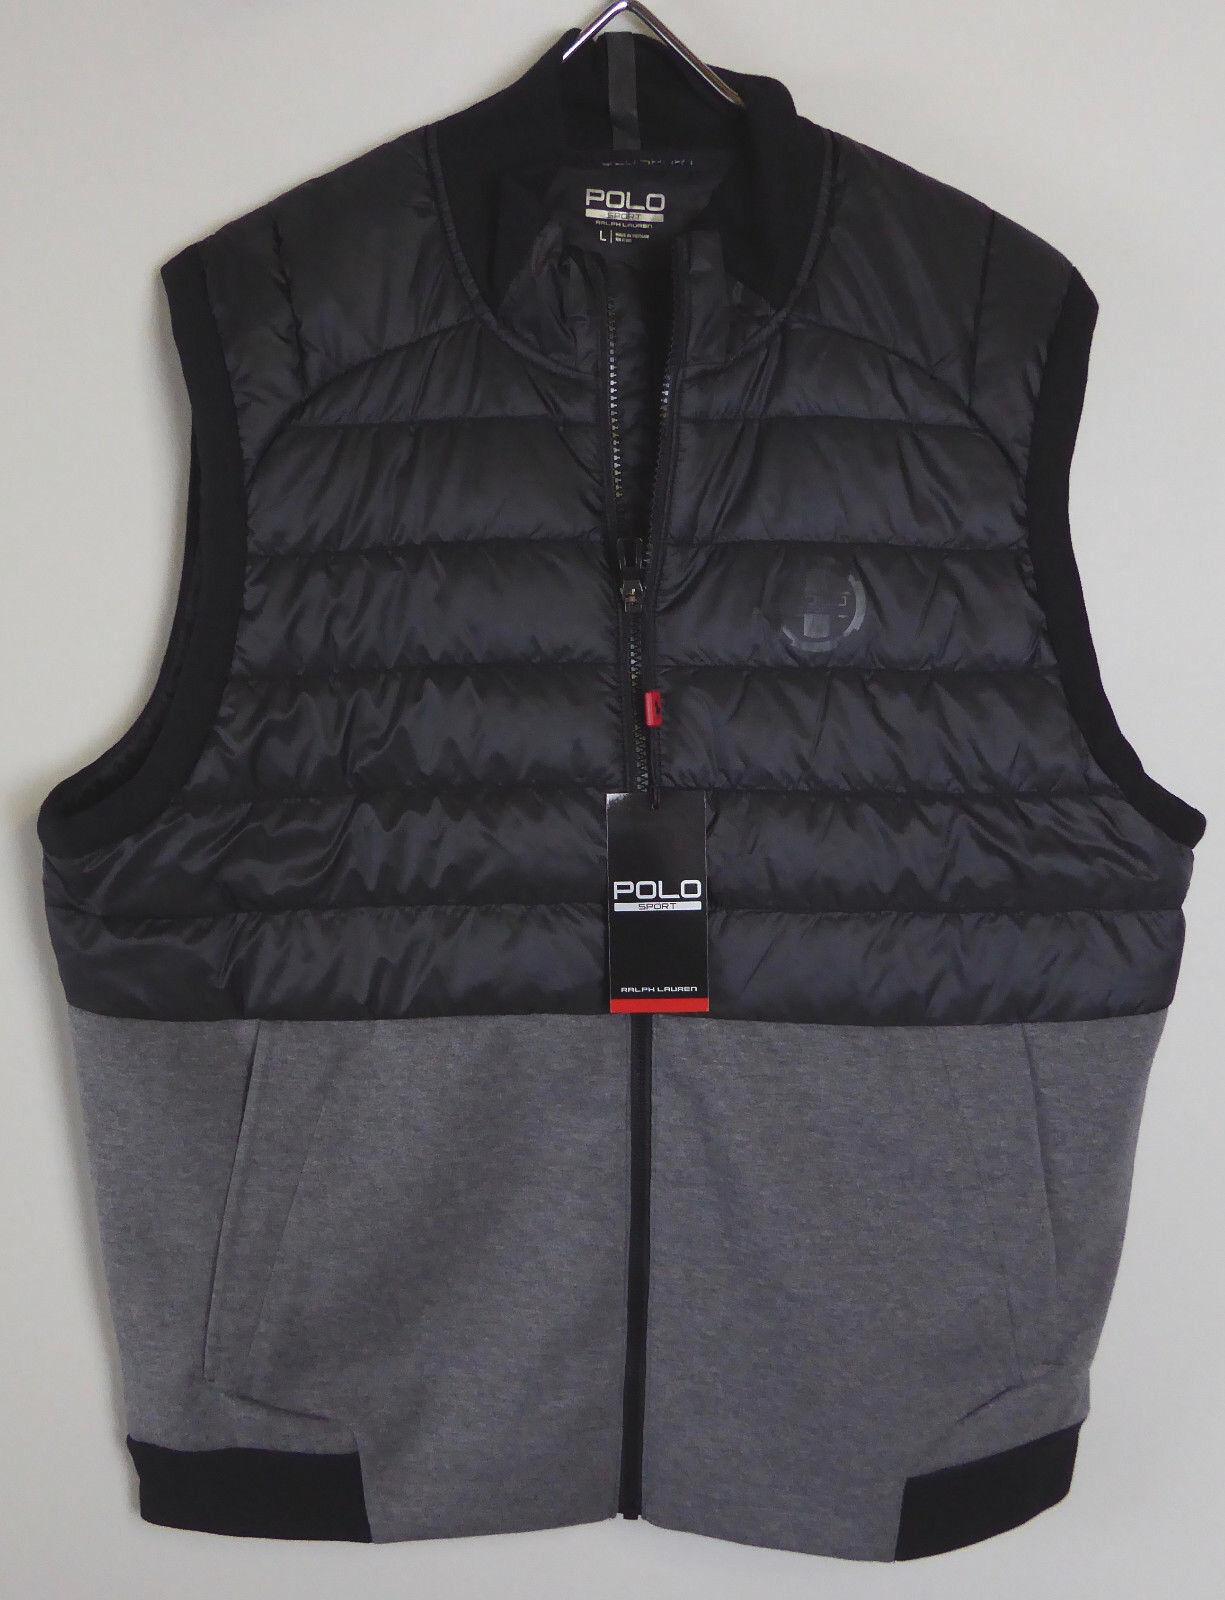 Polo Sport Ralph Lauren Hybrid Vest 750 Fill Puffer & Double Knit Vest NWT  165